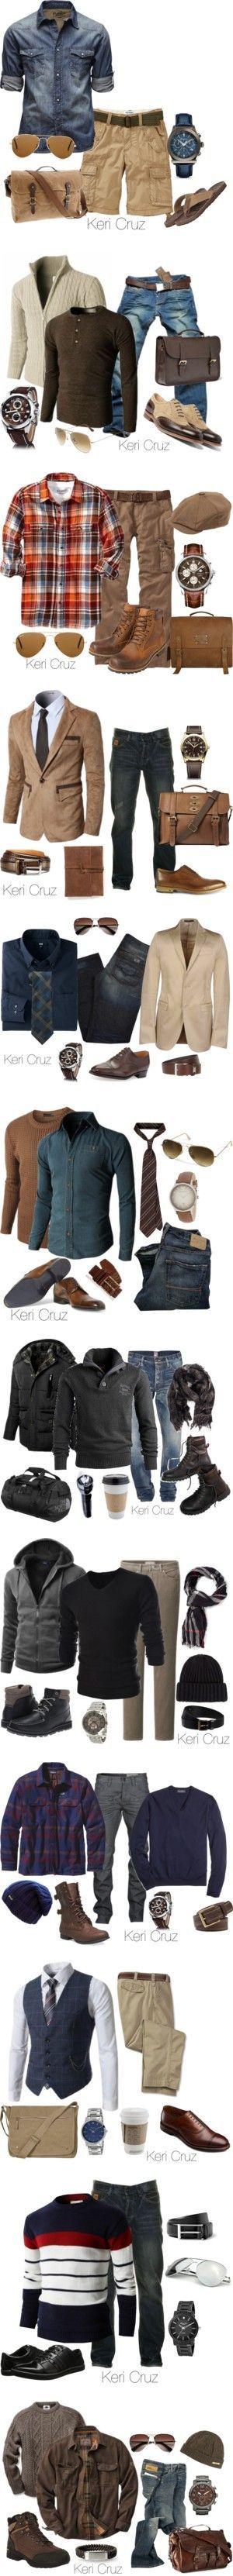 best men fashion images on pinterest man style menus clothing